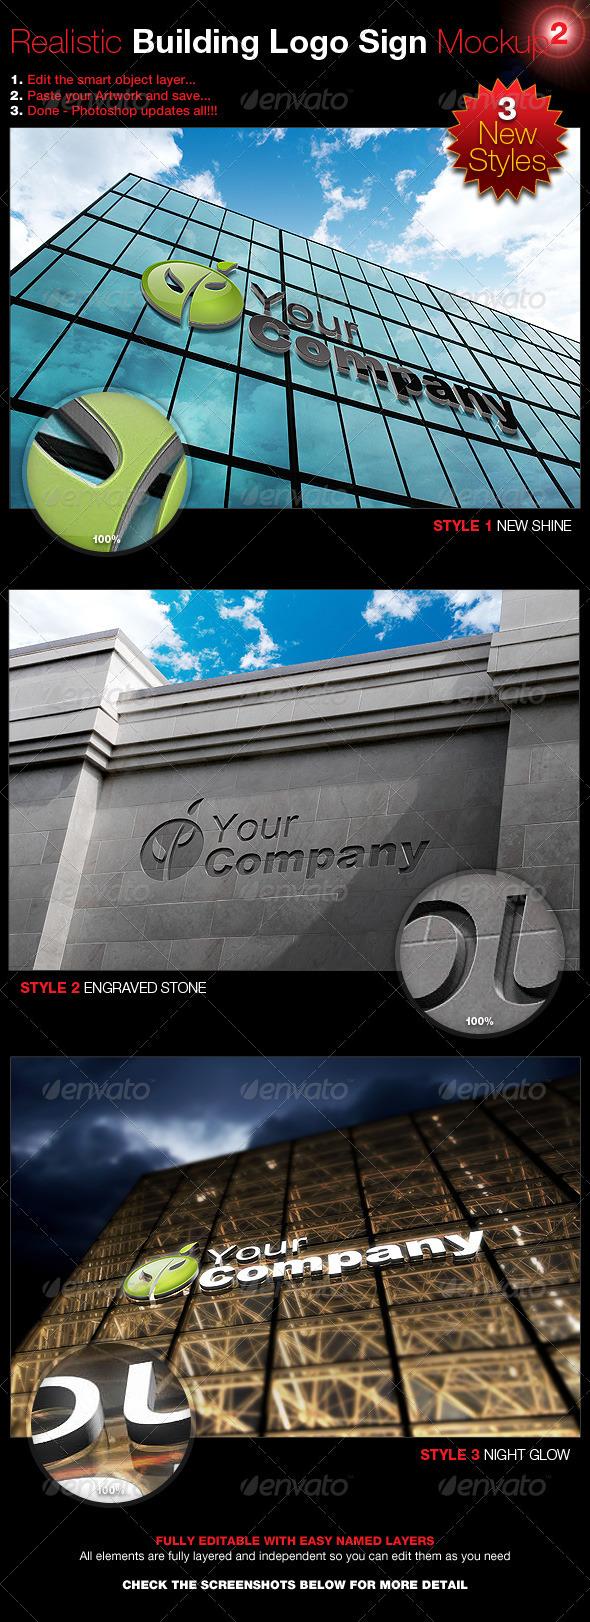 Realistic Building Logo Sign Mock-Up 2 - Logo Product Mock-Ups